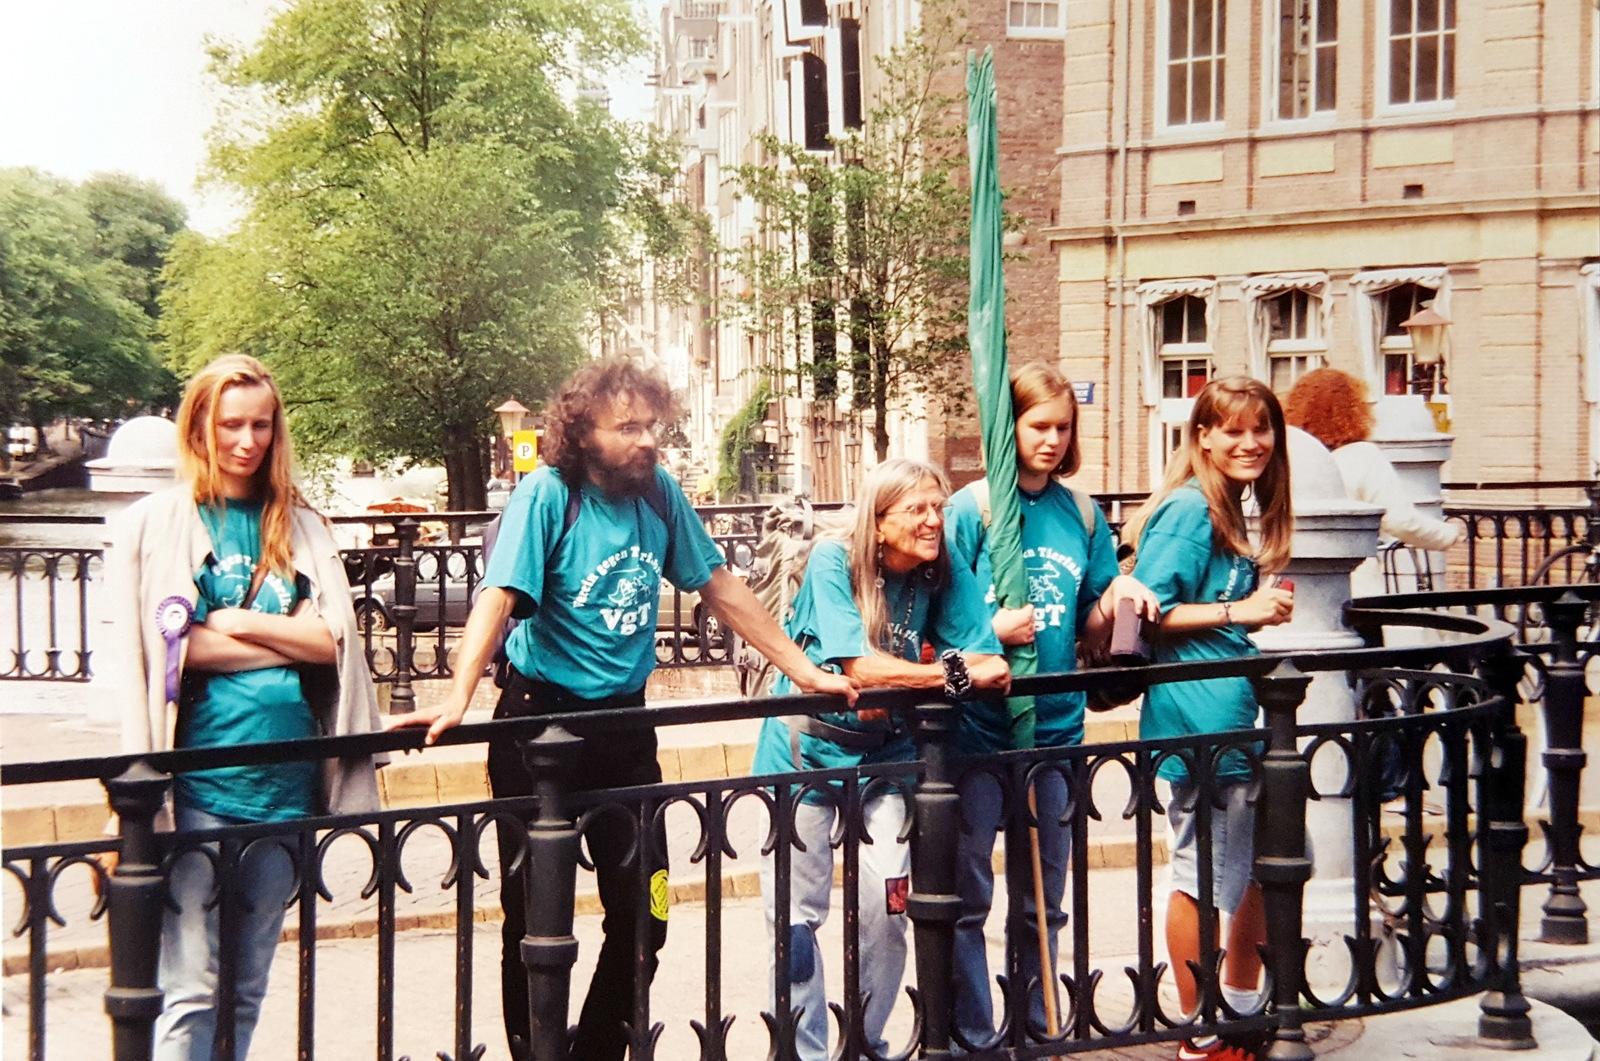 1997-06-16-amsterdam-demo-4